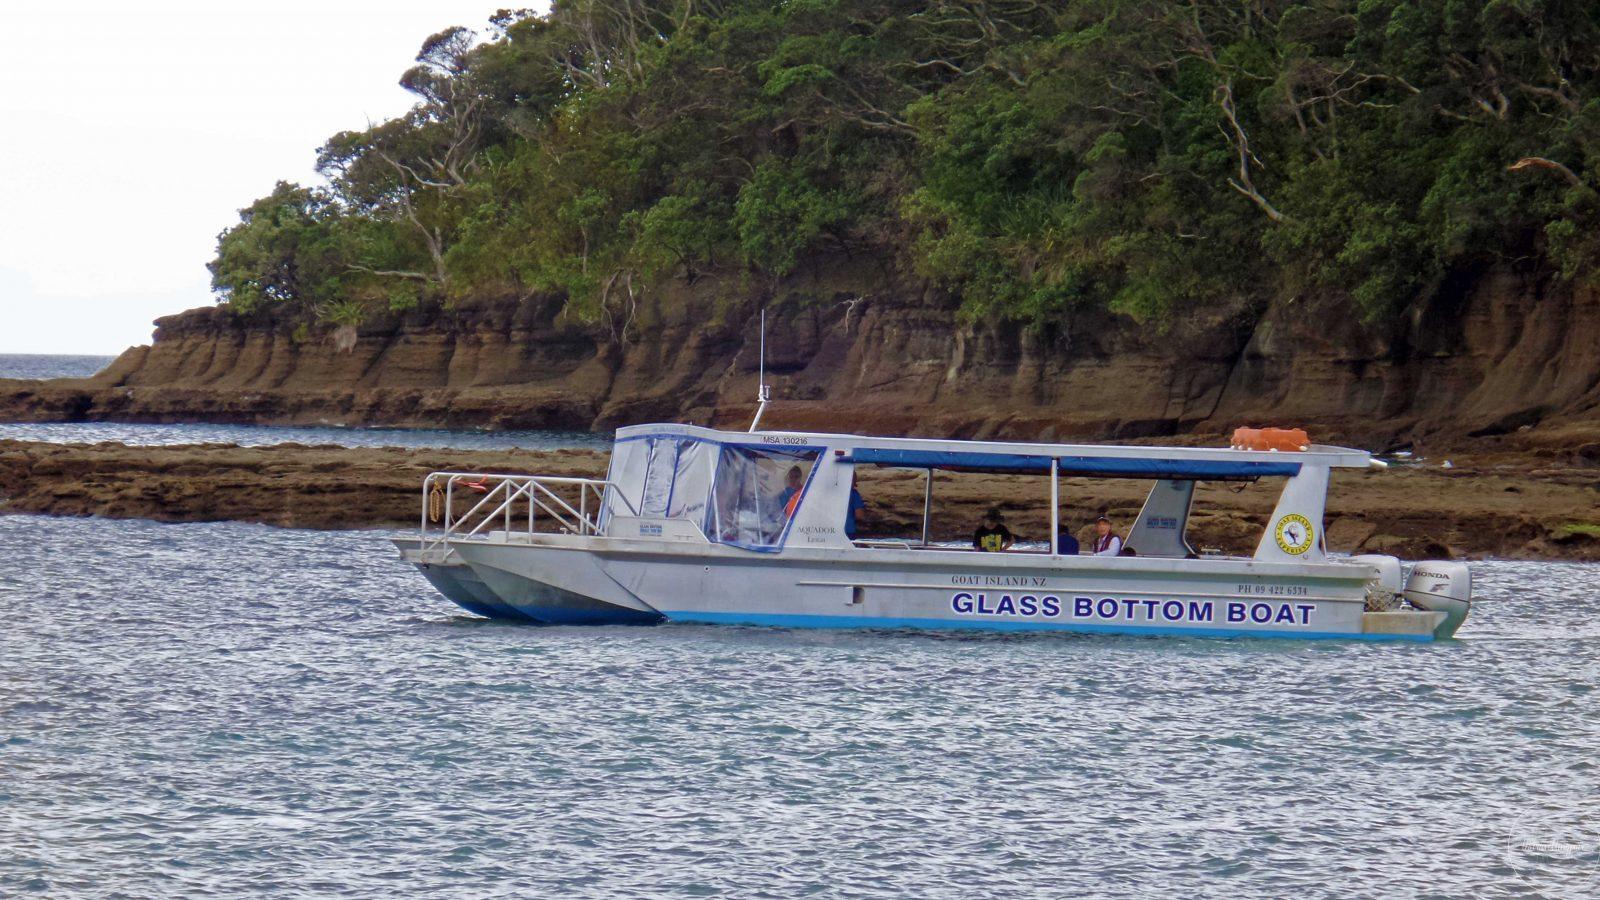 Glass Bottom Boat in Goat Island